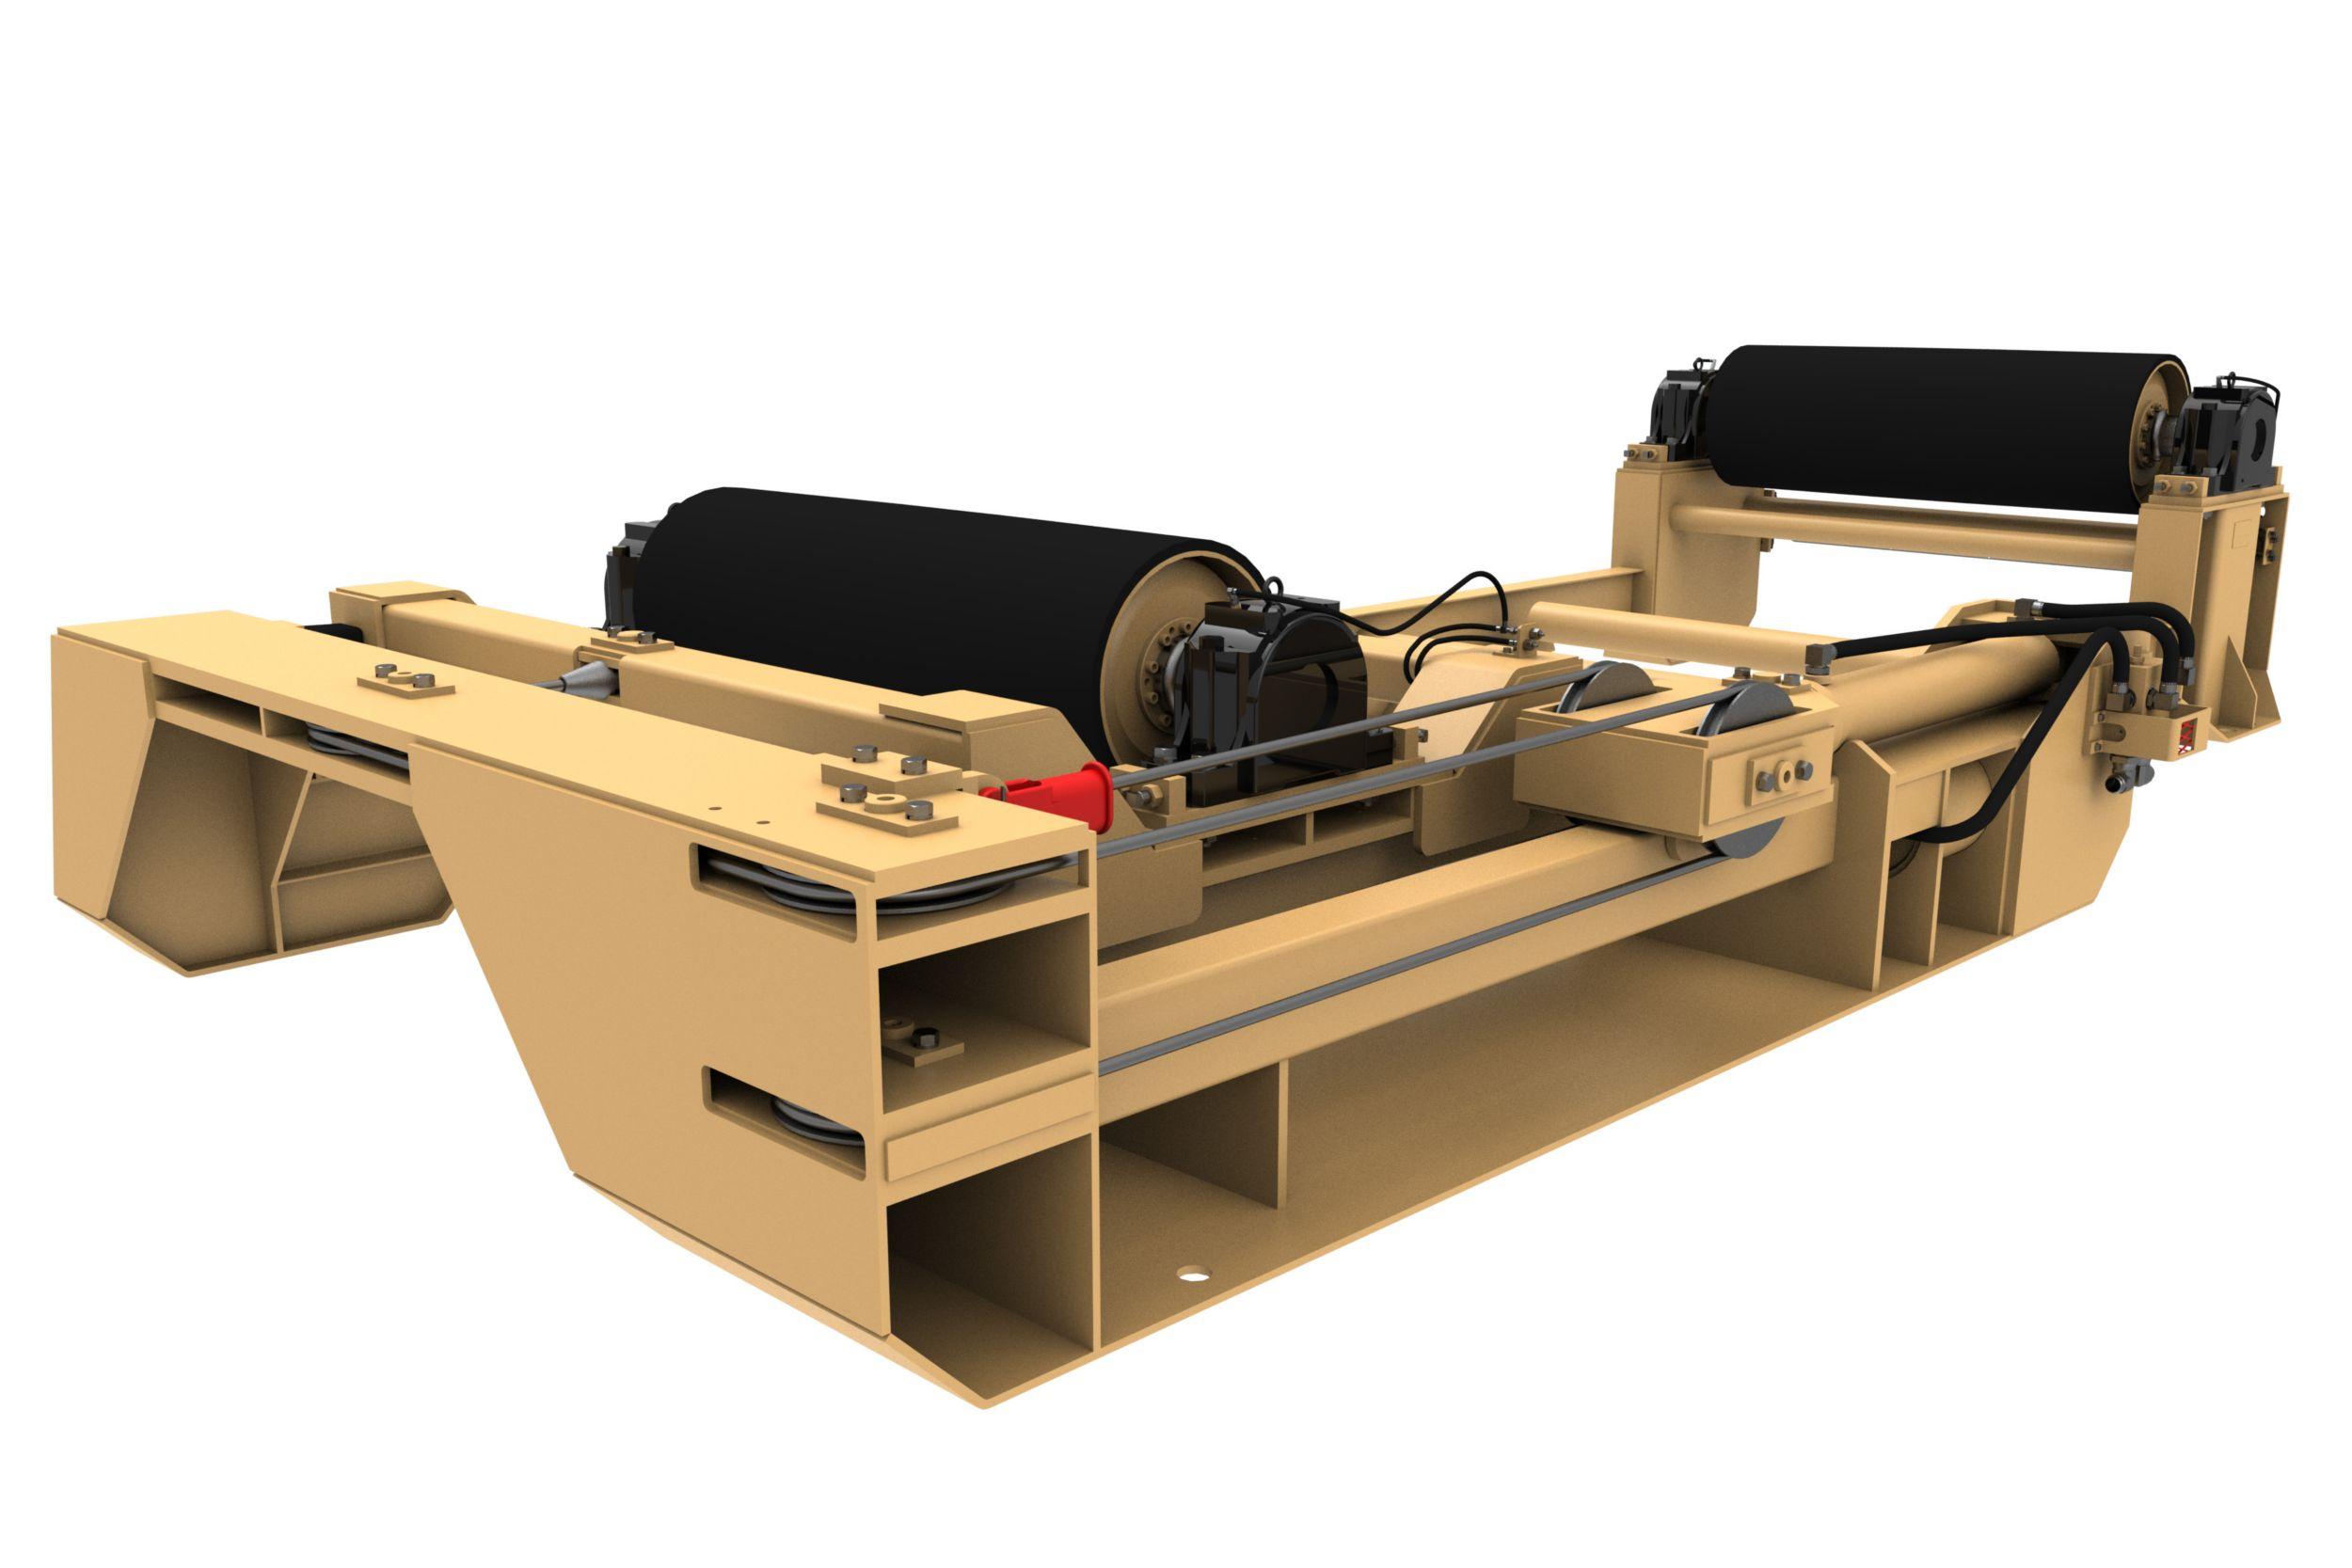 Underground-Mining-Conveyor-Systems